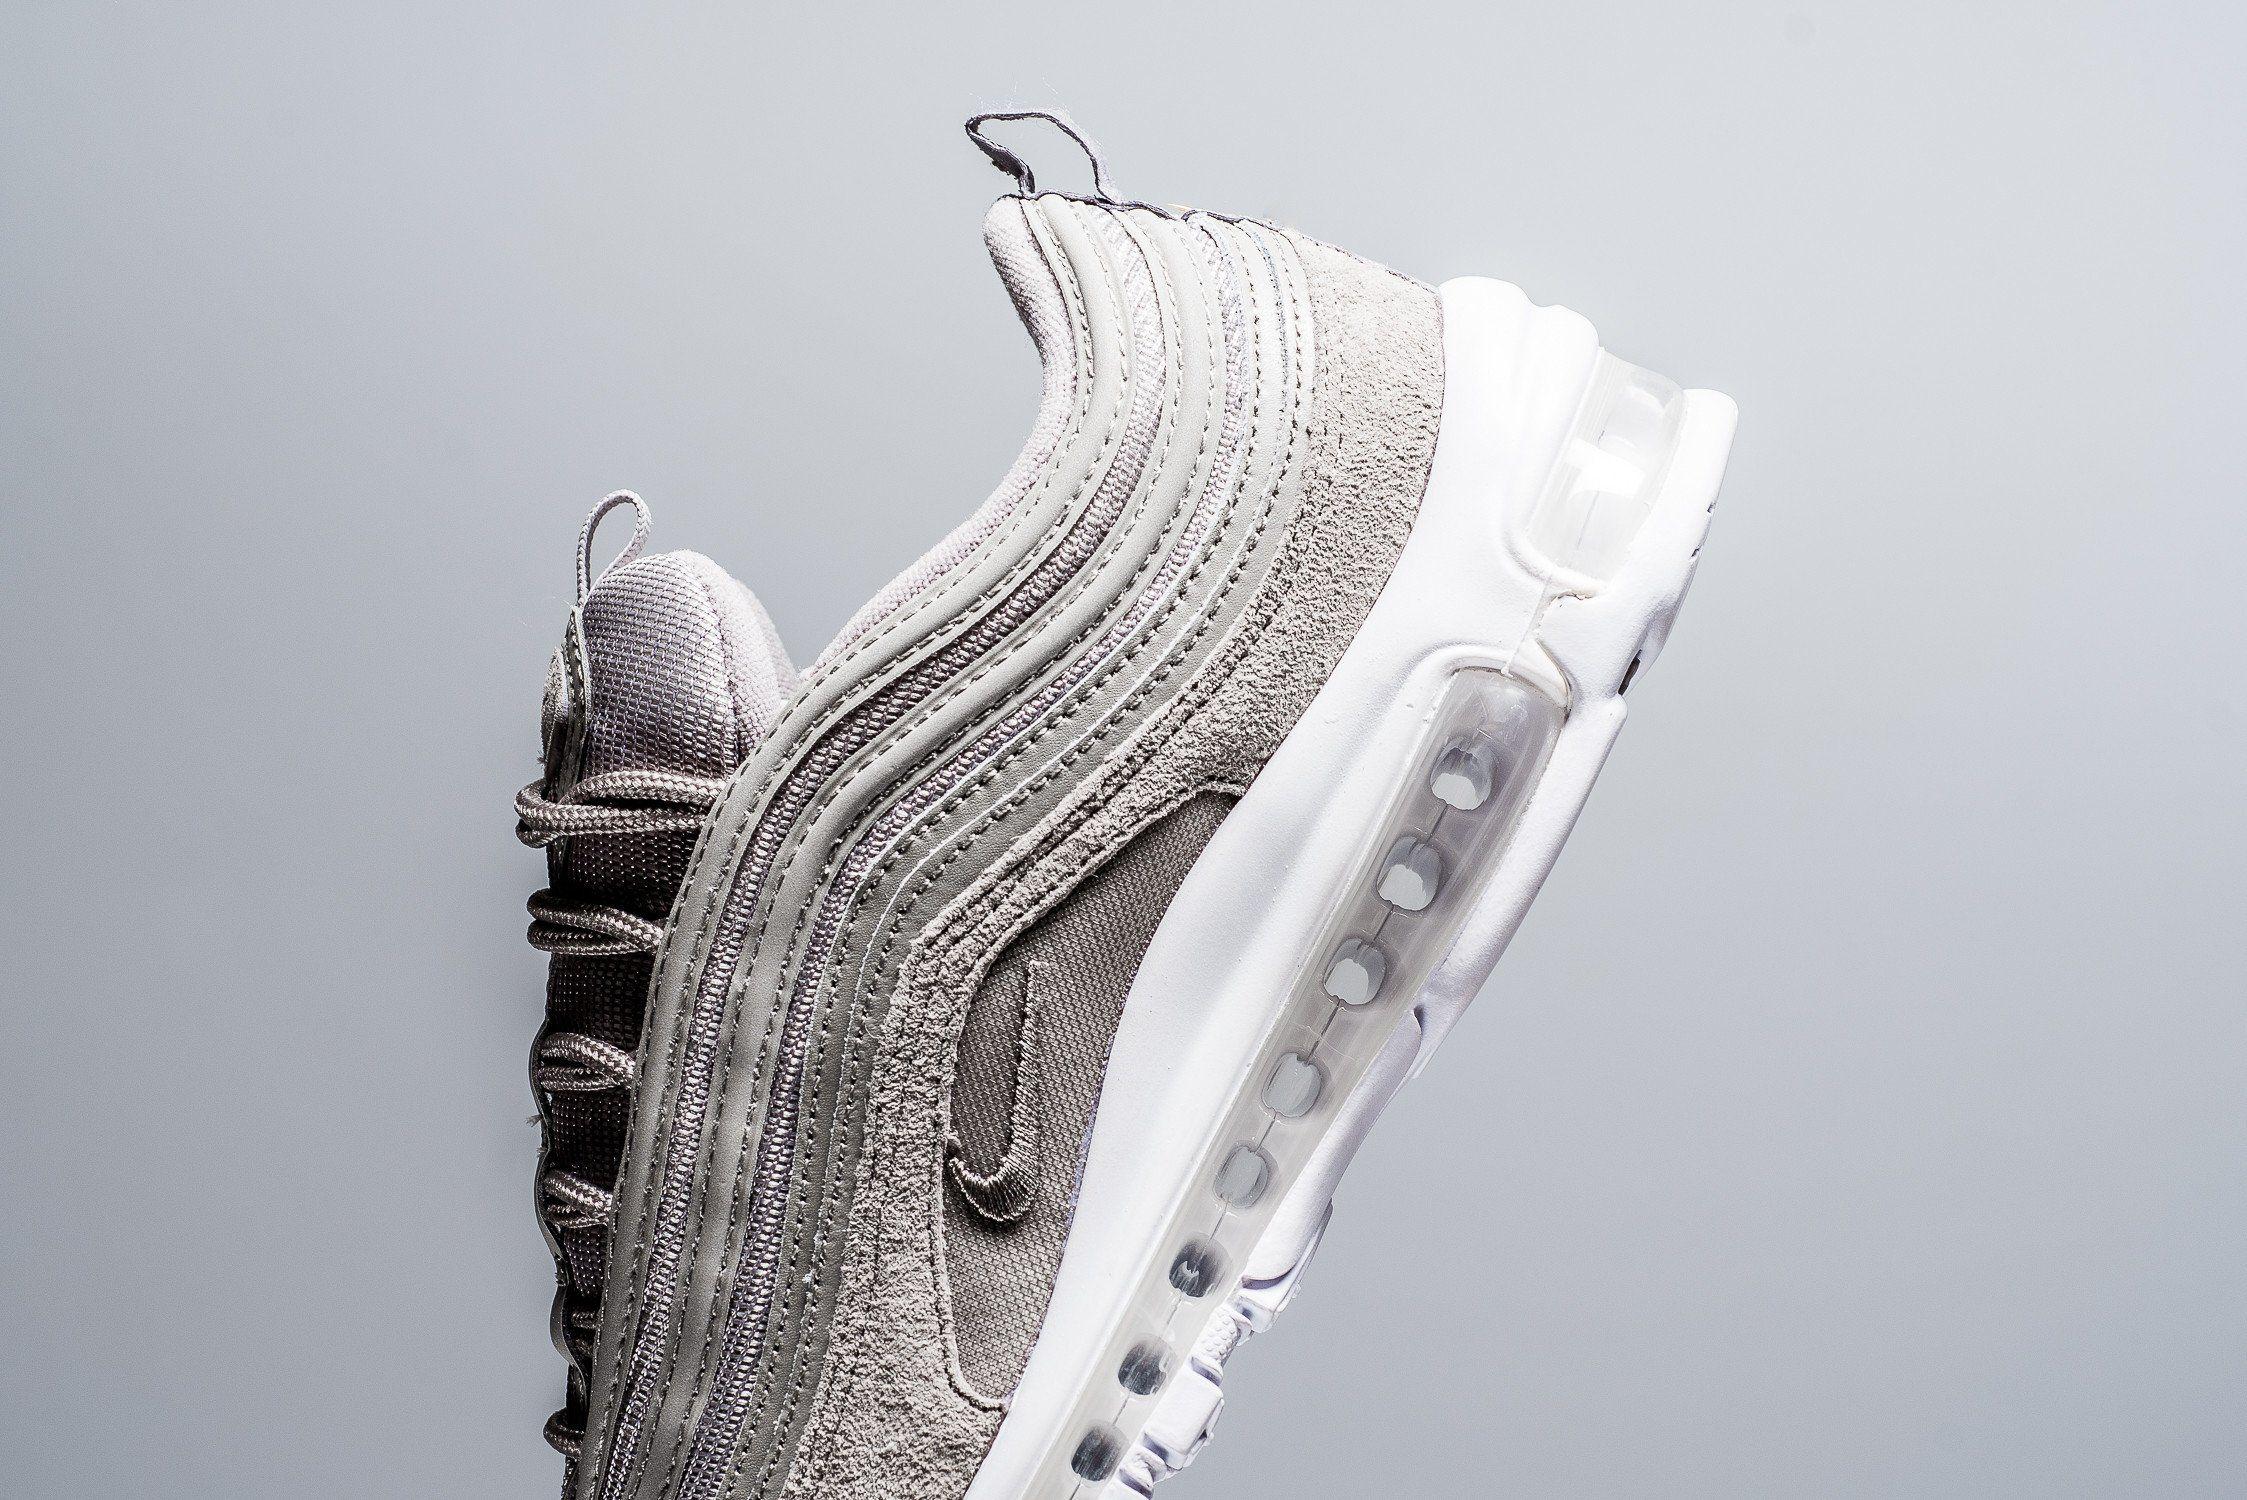 Nike Air Max 97 'Cobblestone Cobblestone white' | UNBOXING & ON FEET | fashion shoes | 2017 | HD